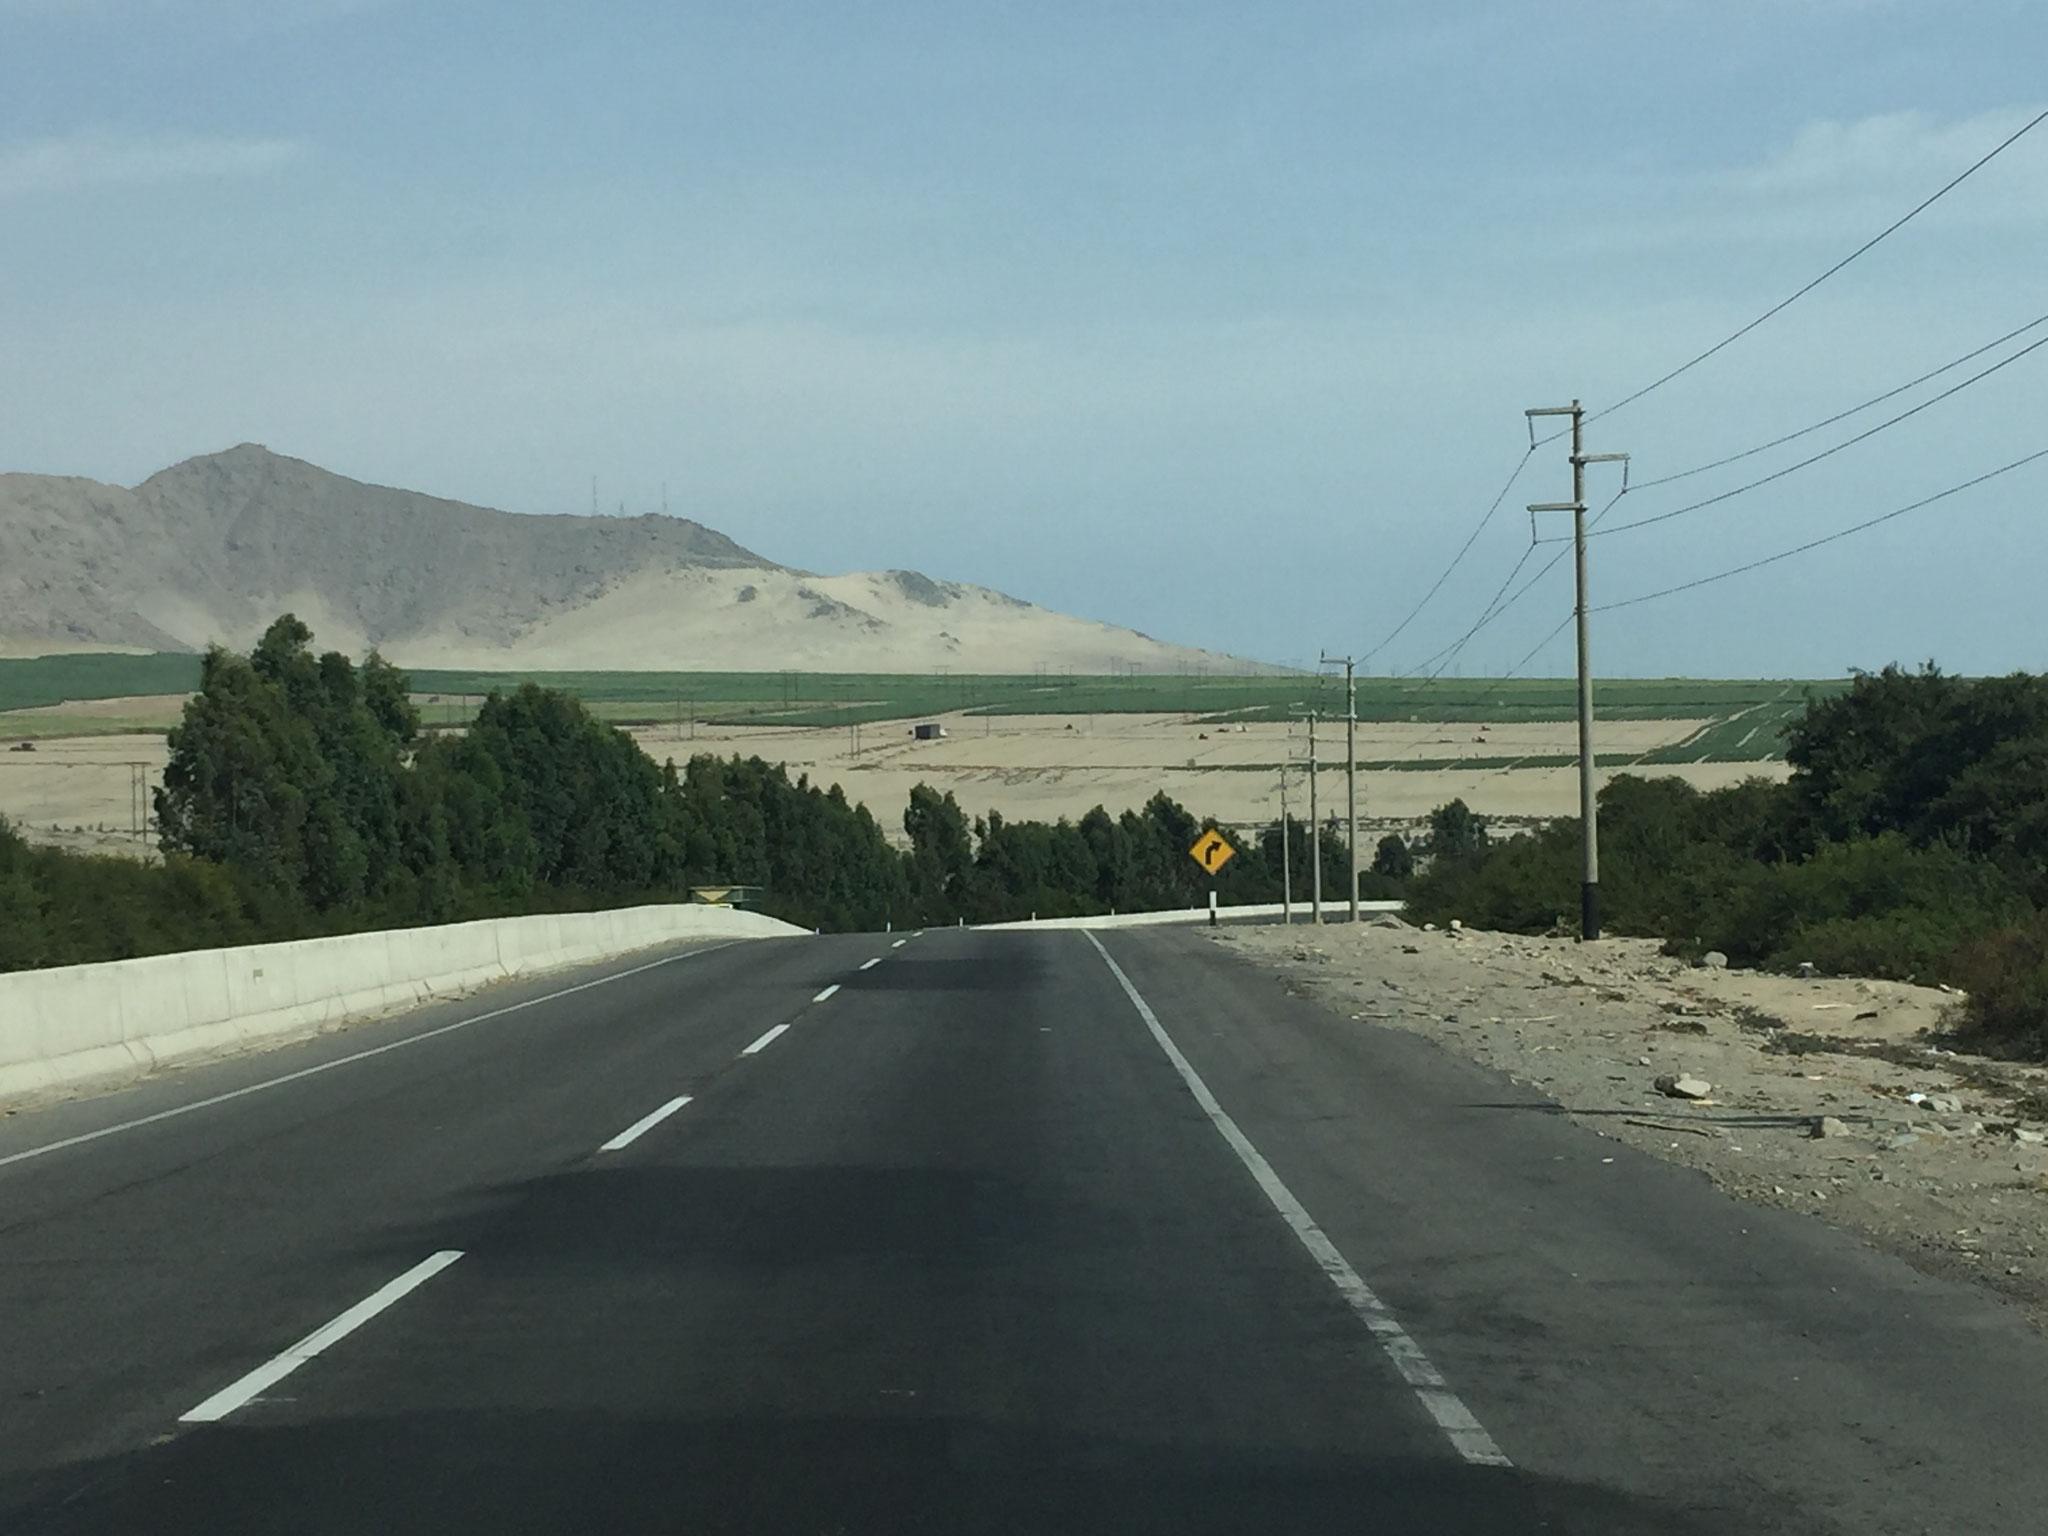 Wüste, Wüste, Wüste